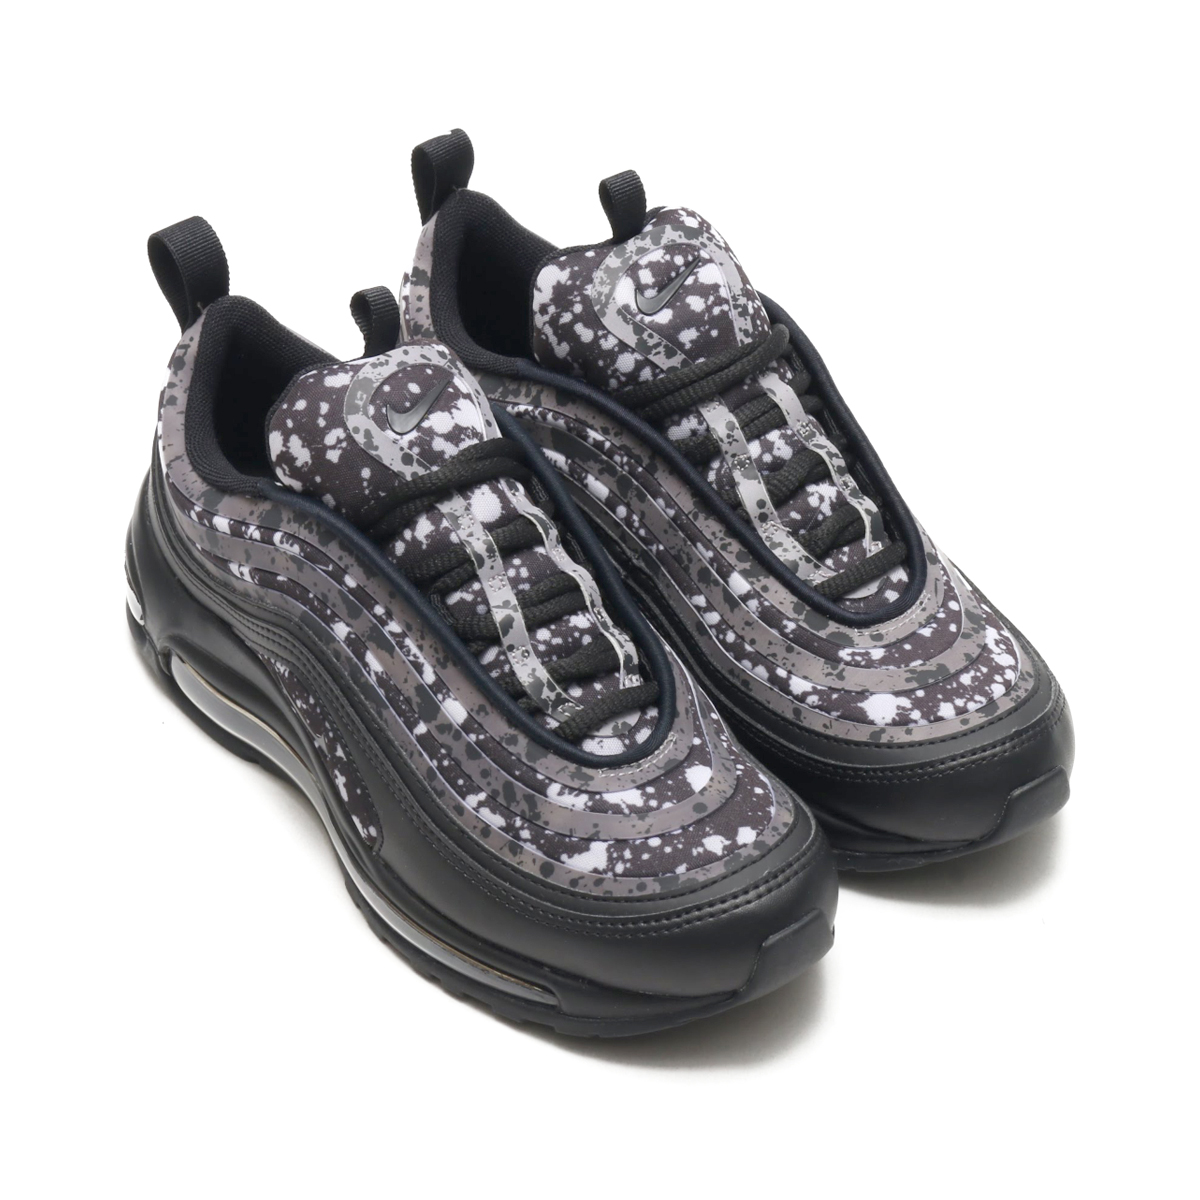 the best attitude e34d7 80196 NIKE W AIR MAX 97 UL  17 PRM (Nike women Air Max 97 UL 17 premium) (BLACK  BLACK-VAST GREY) 18SU-S